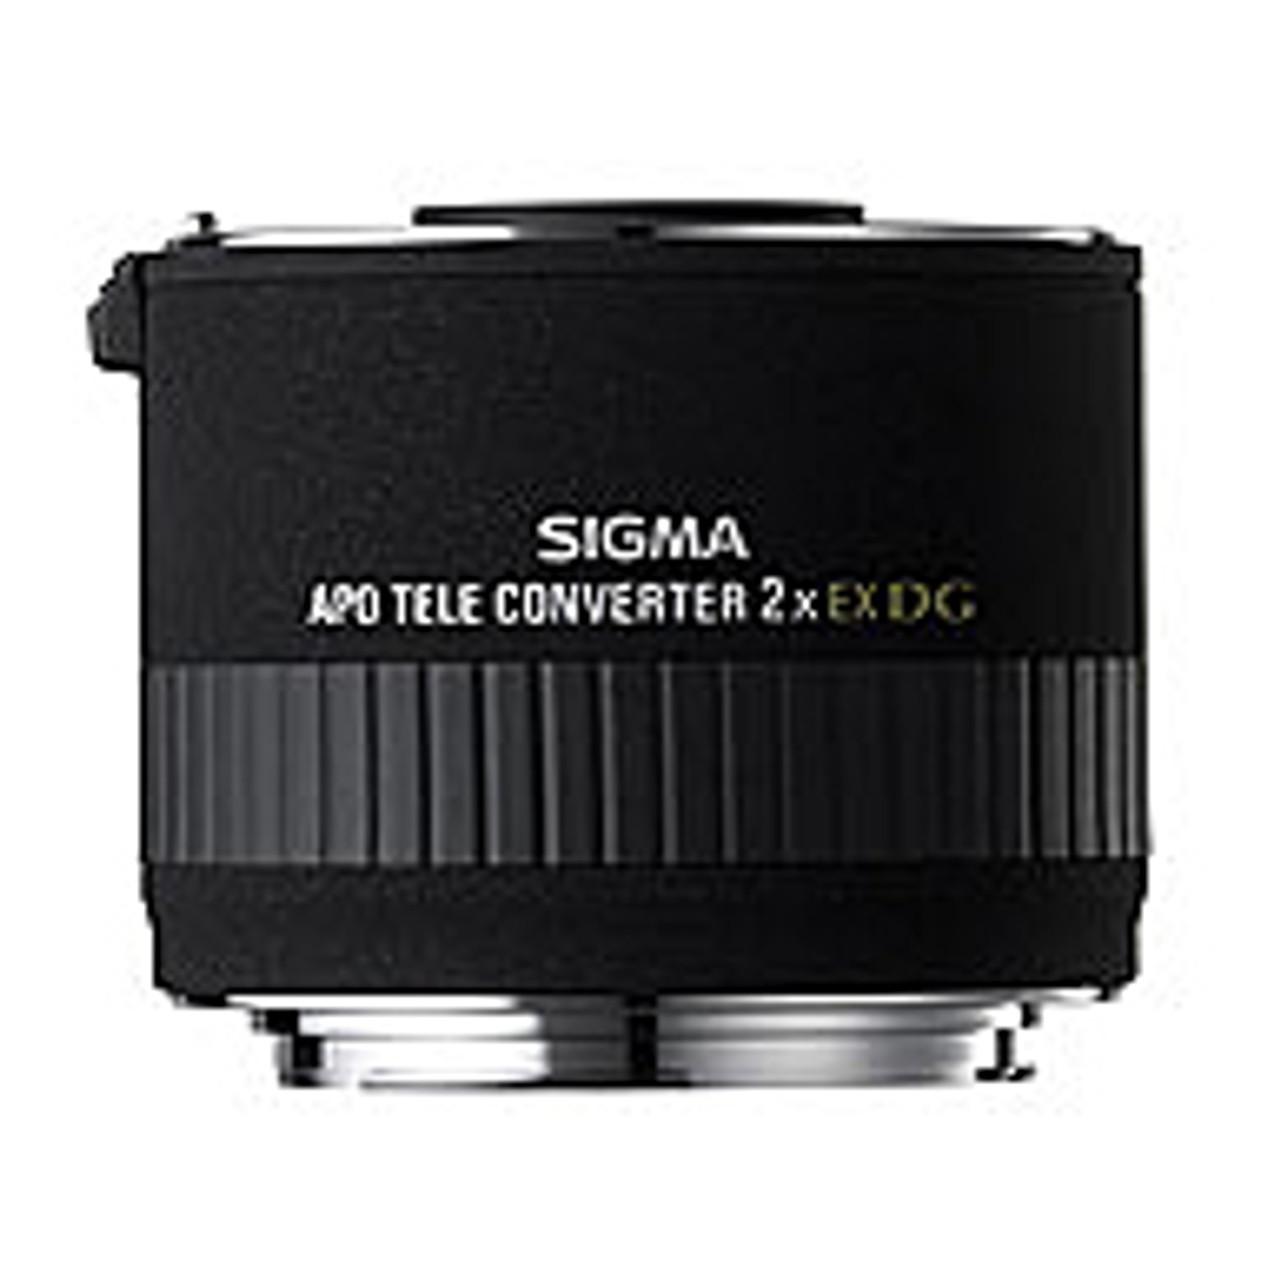 Sigma 2x EX DG Tele Converter for Nikon